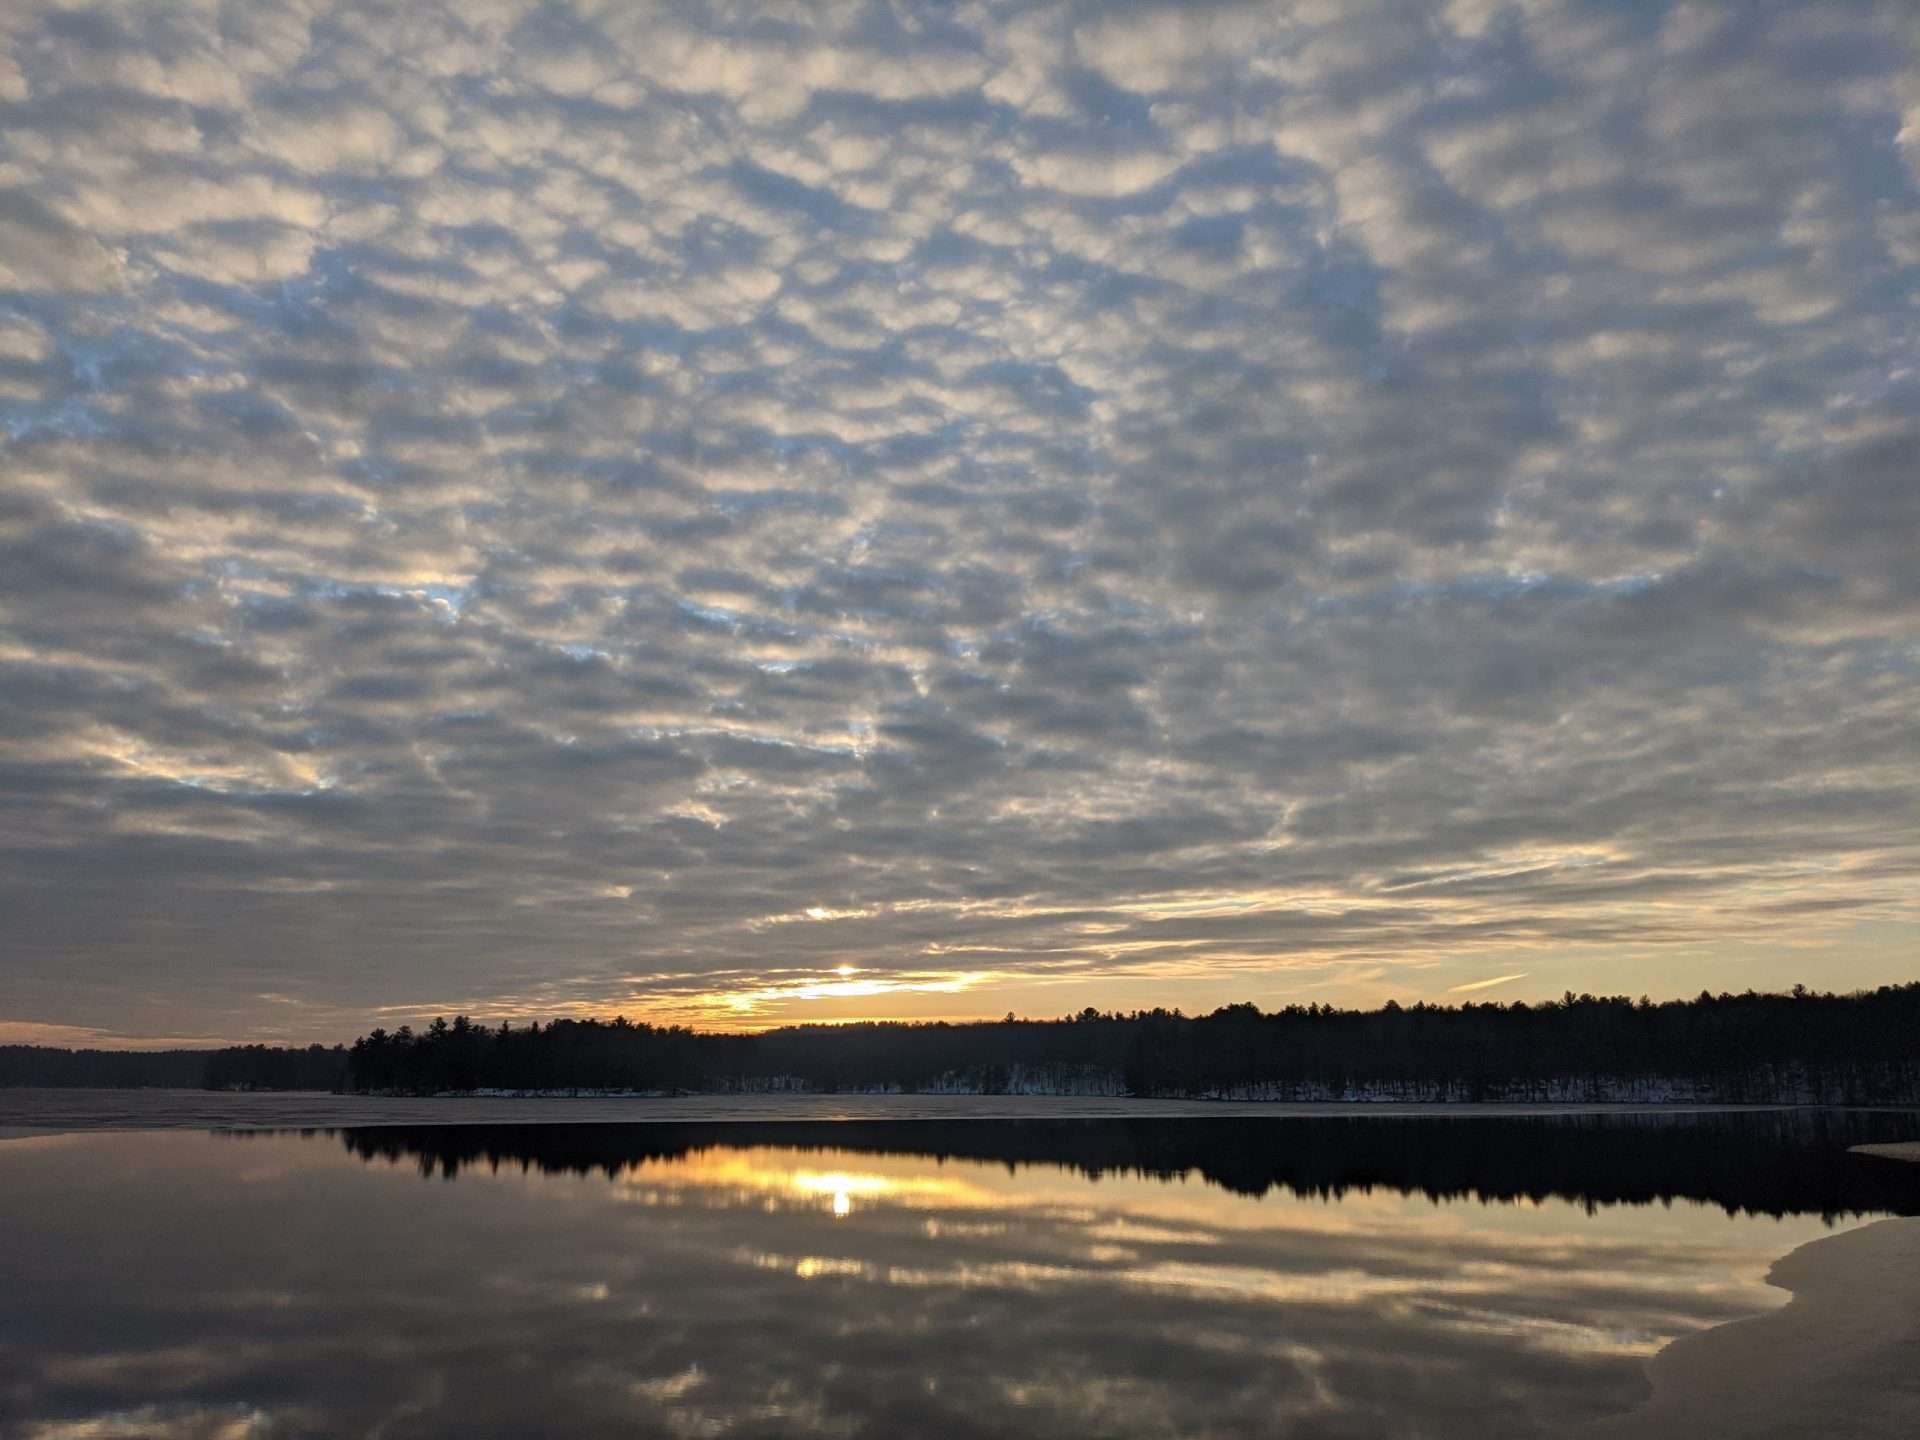 Sunset Reflection on Ashland Reservoir Ice December 21, 2020